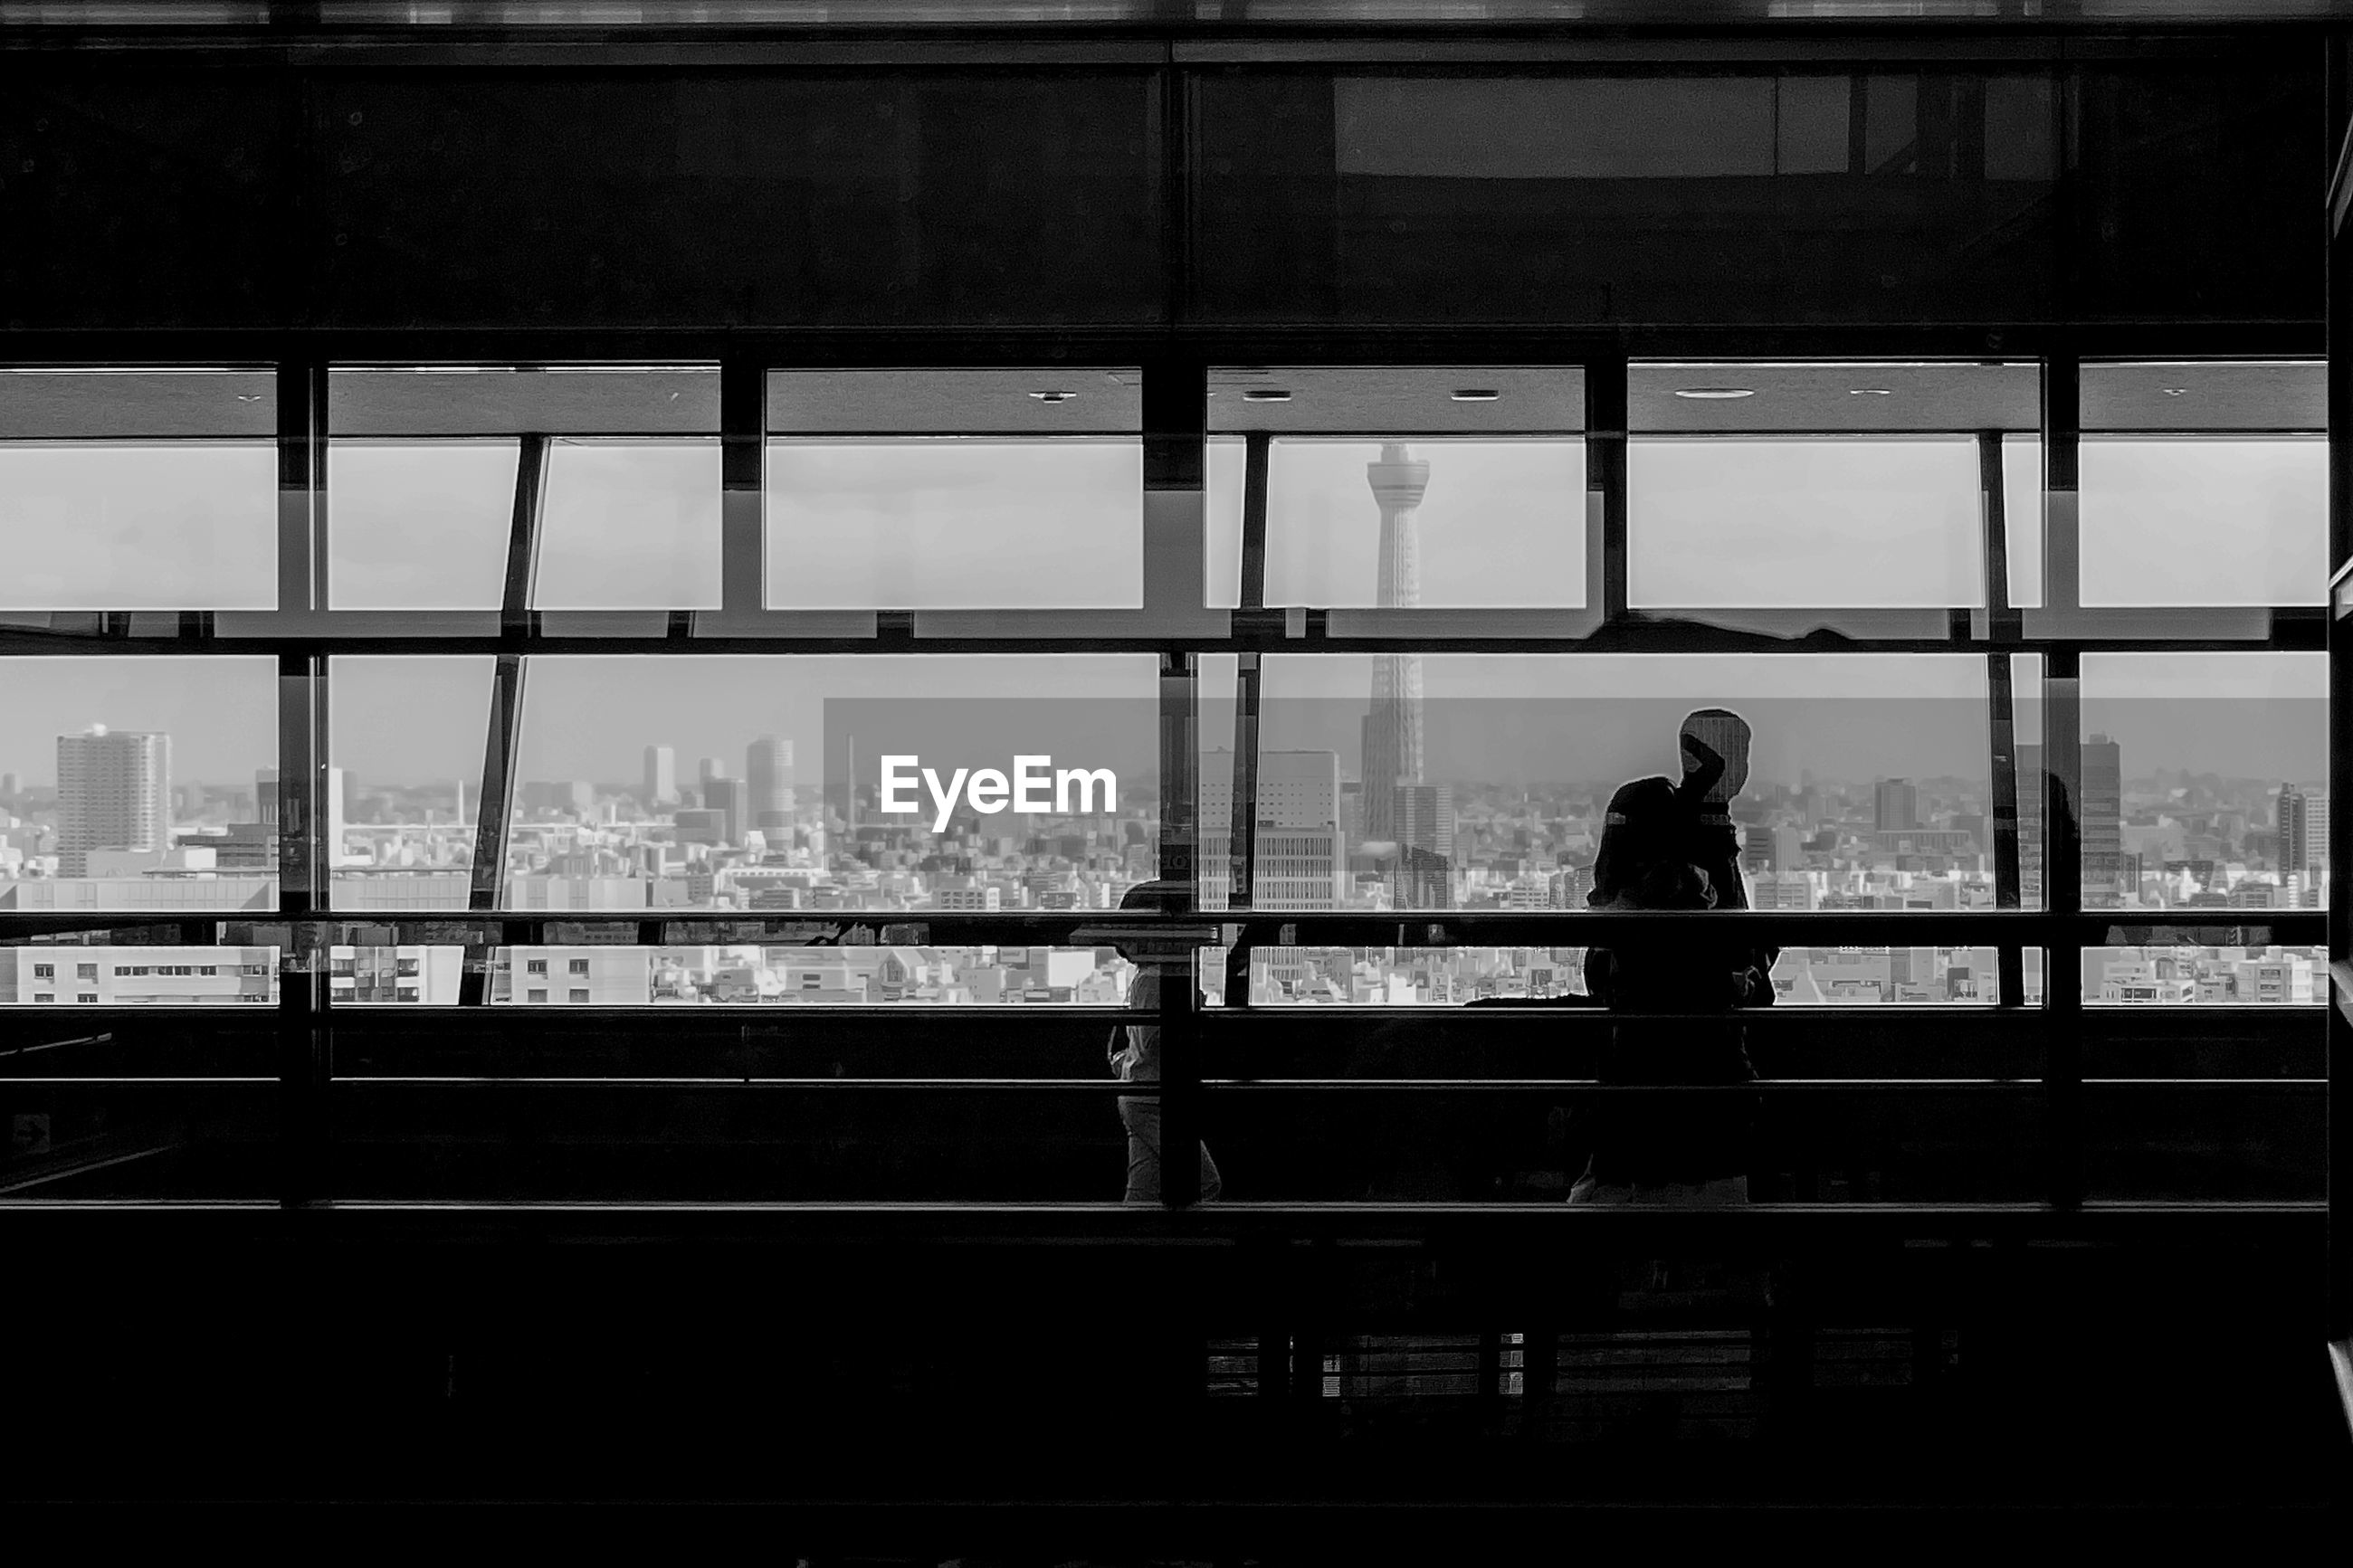 People seen through glass window walking in building